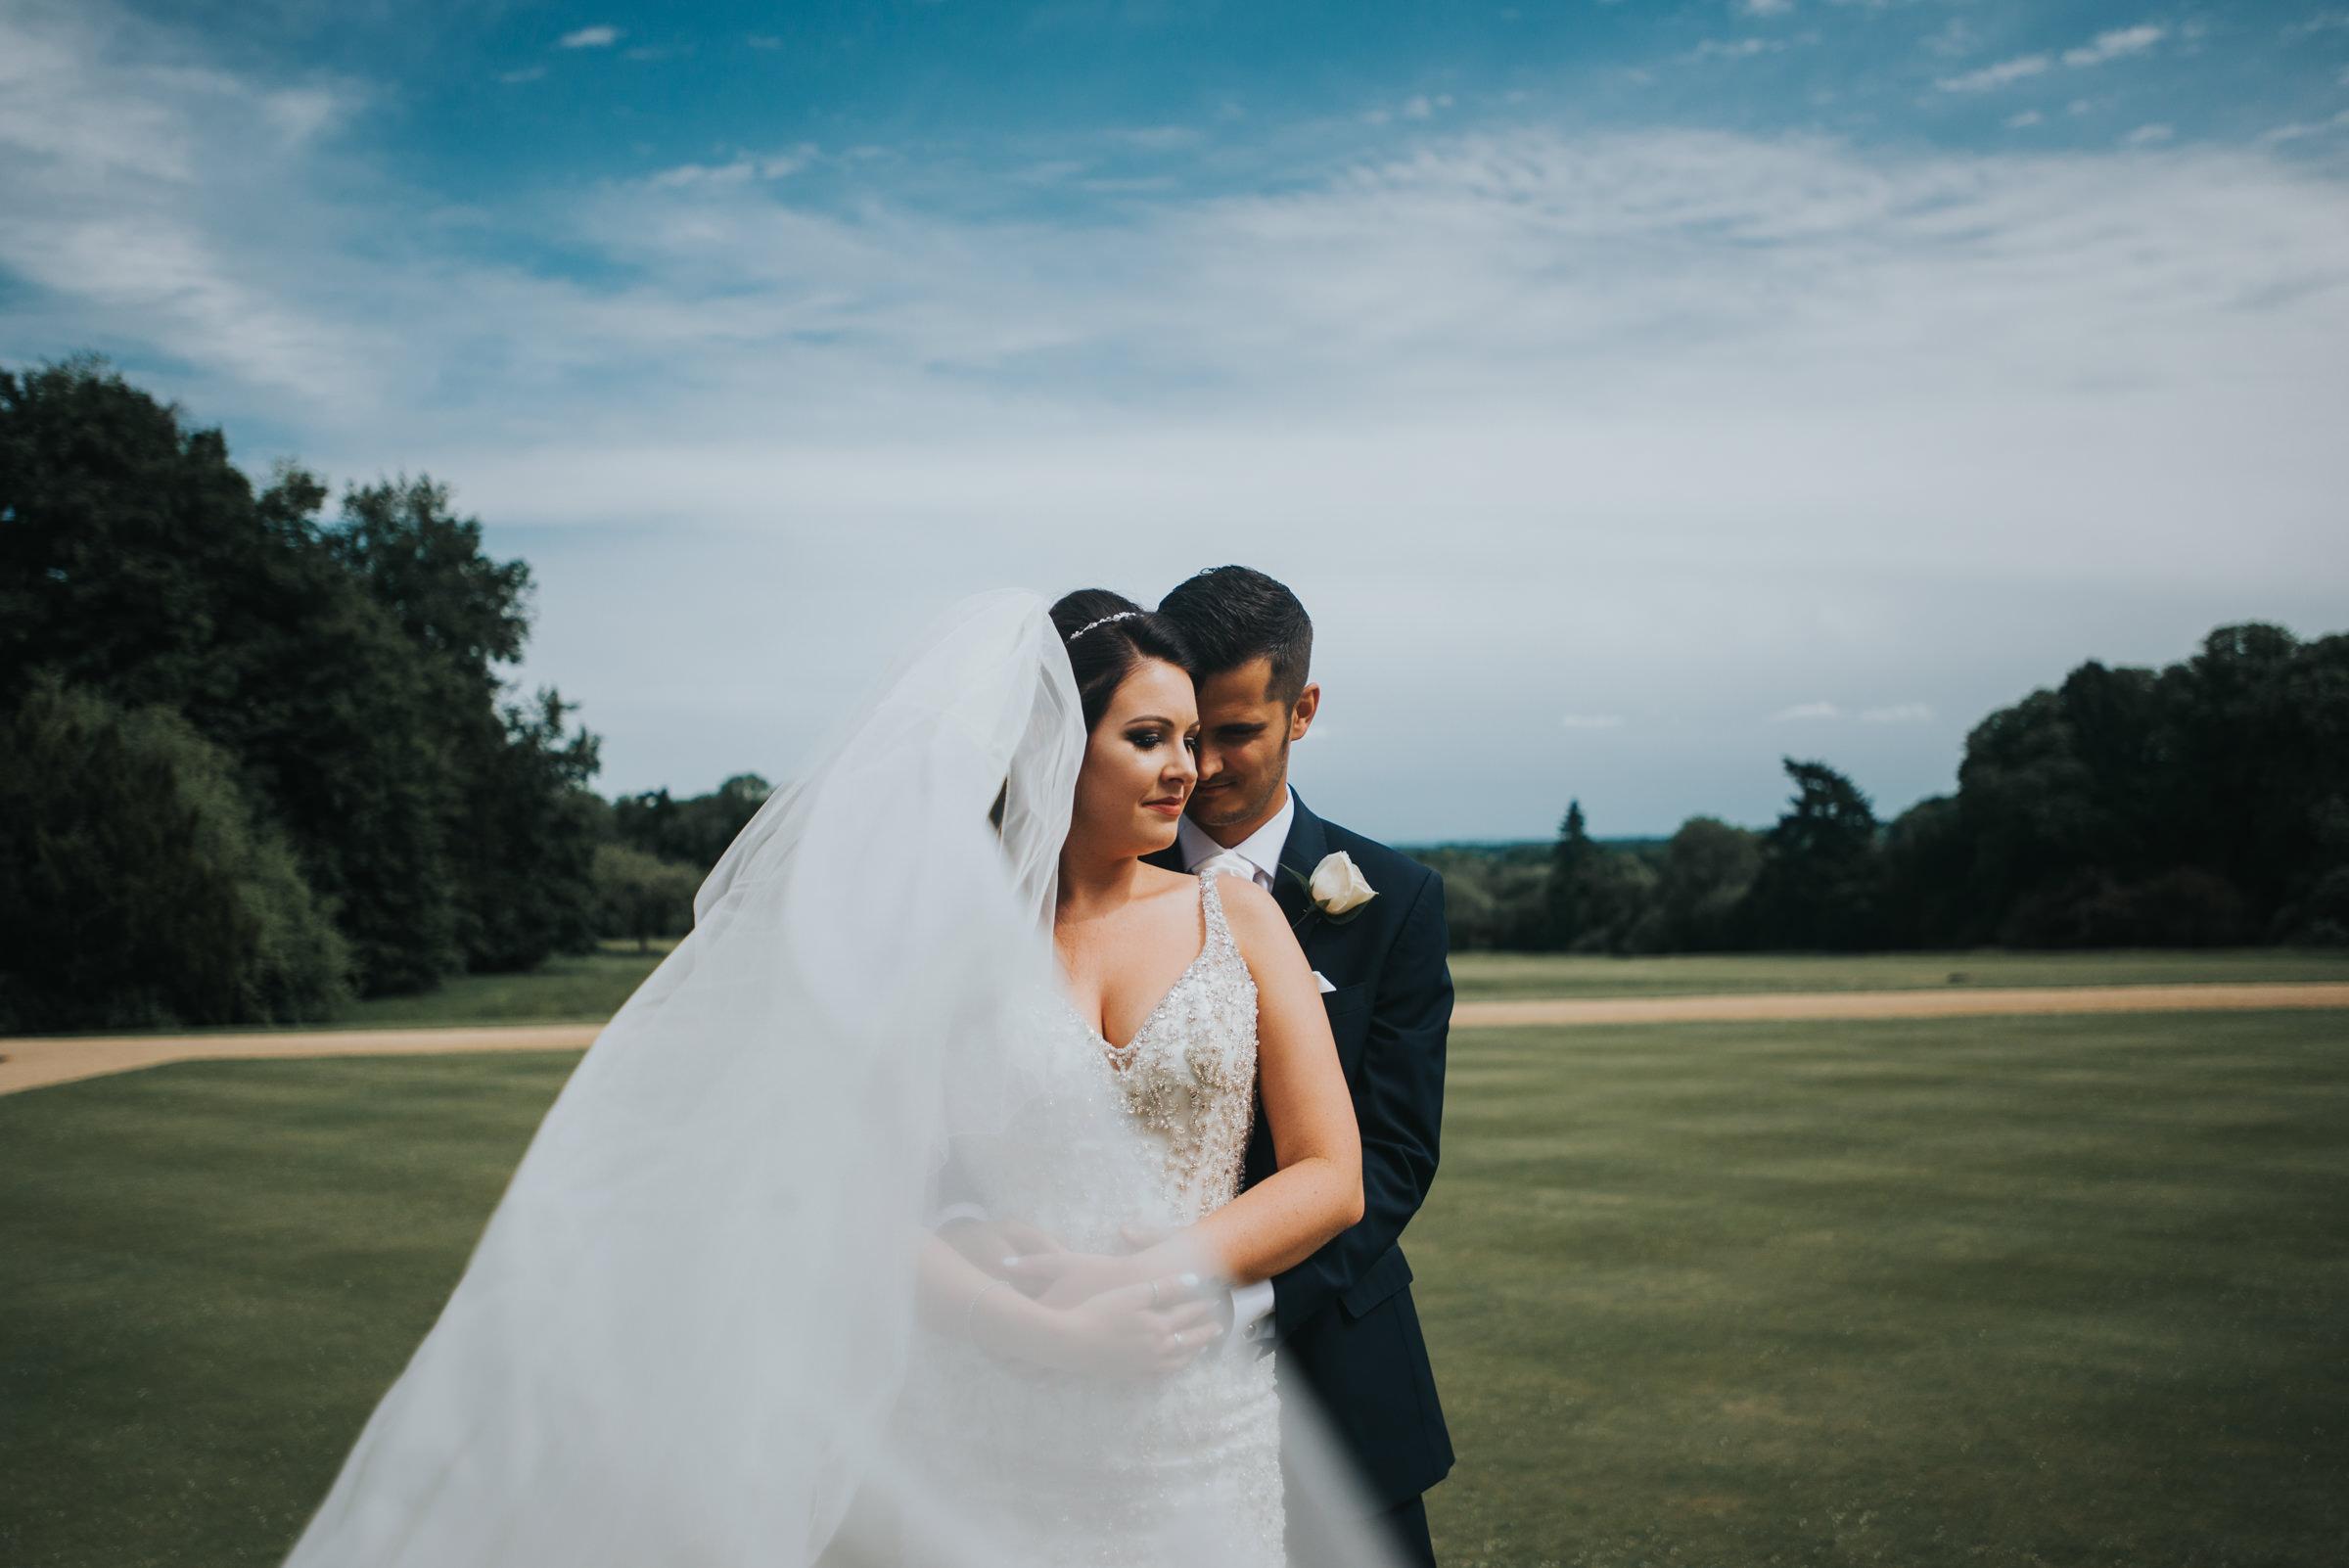 Heythrop Park Wedding Oxfordshire-204.JPG